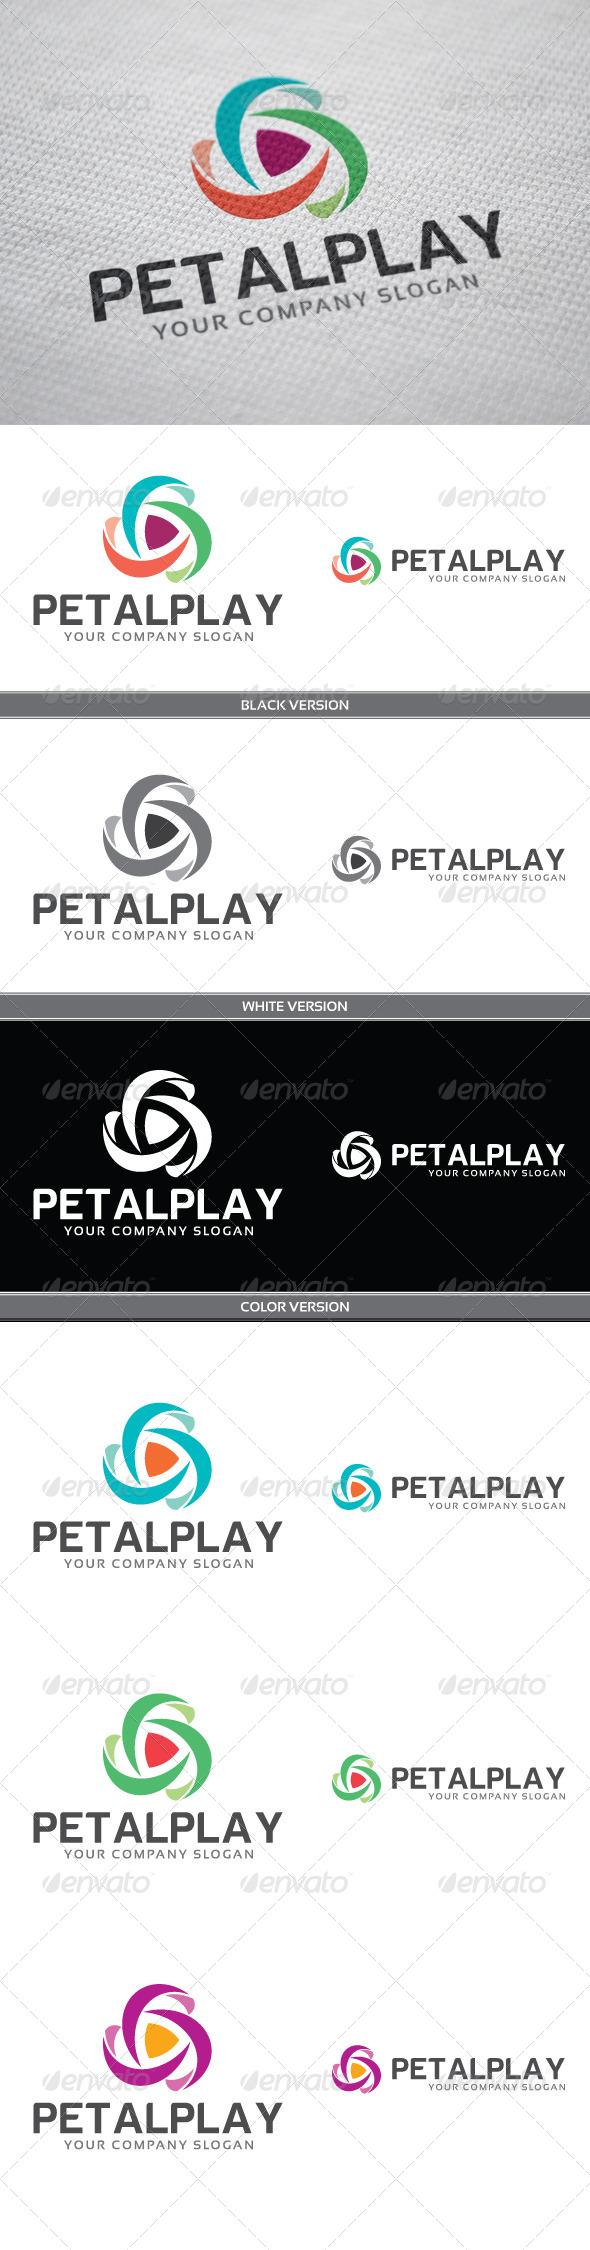 PetalPlay